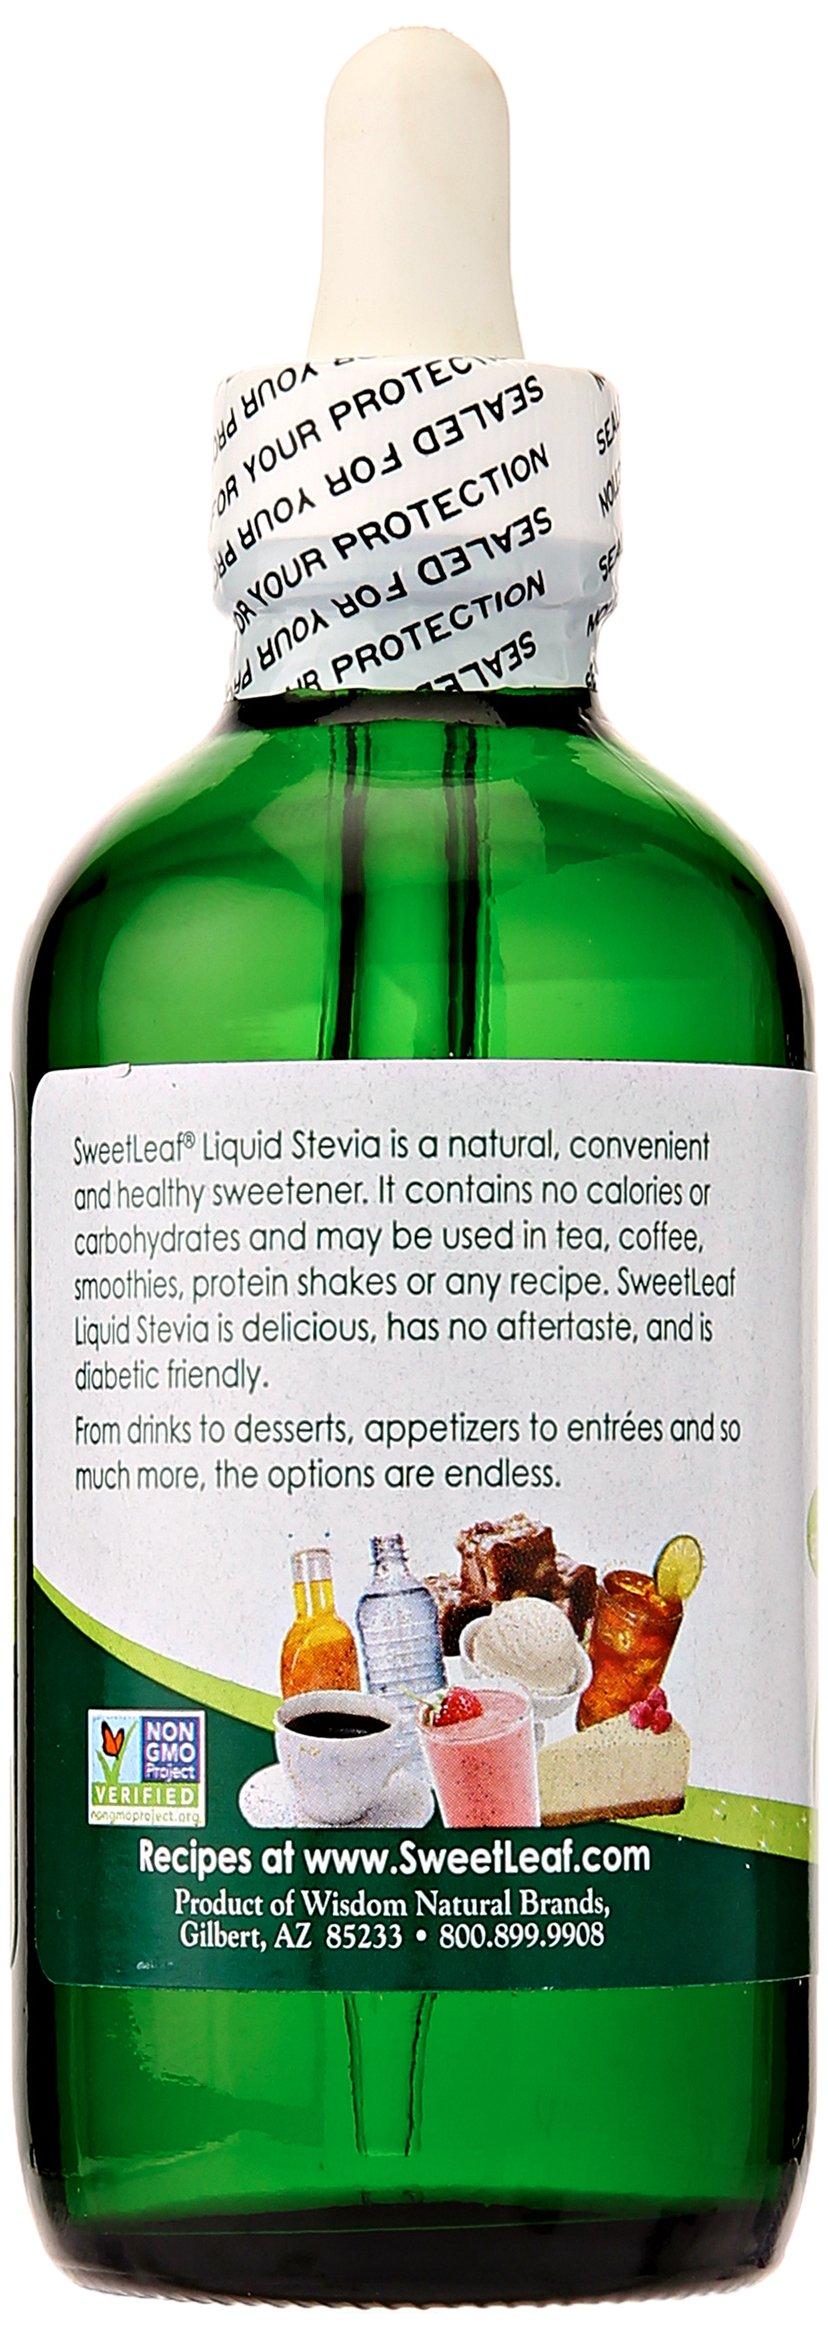 Sweet Drops SweetLeaf Liquid Stevia Sweetener, SteviaClear, 4 oz by Sweet Drops (Image #2)